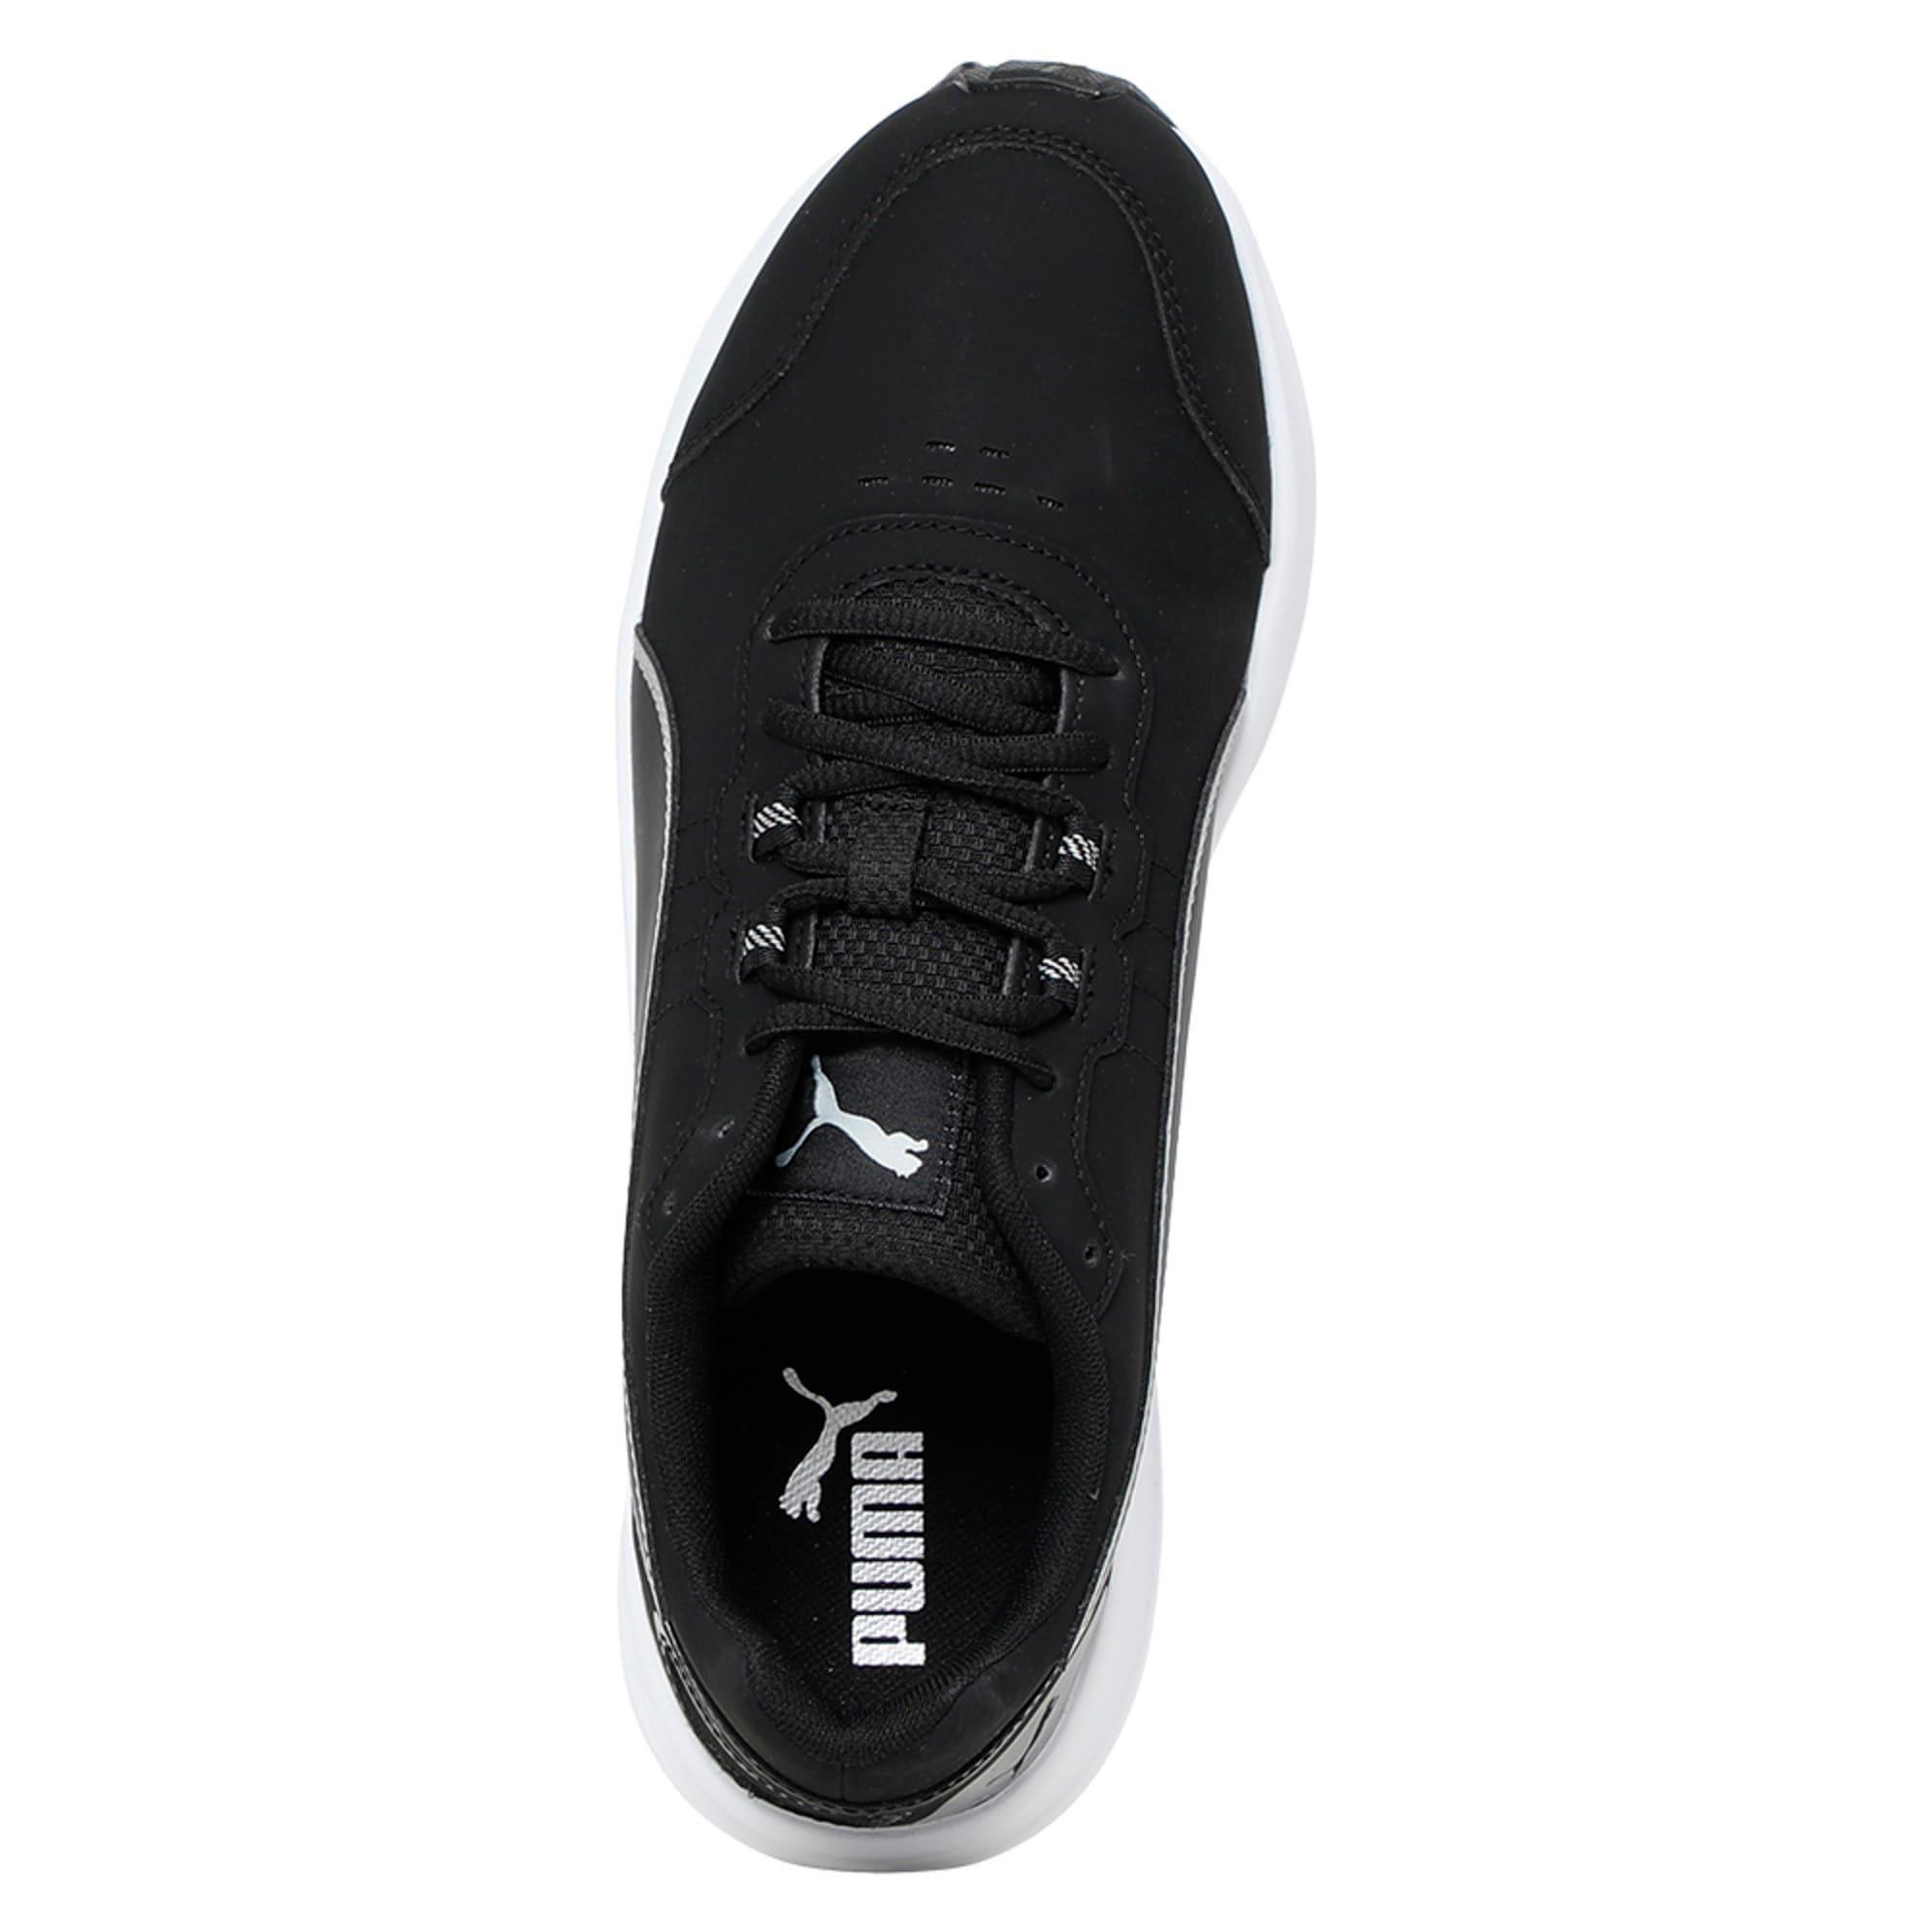 Thumbnail 3 of Descendant v4 SL Running Shoes, Puma Black-Puma Silver, medium-IND